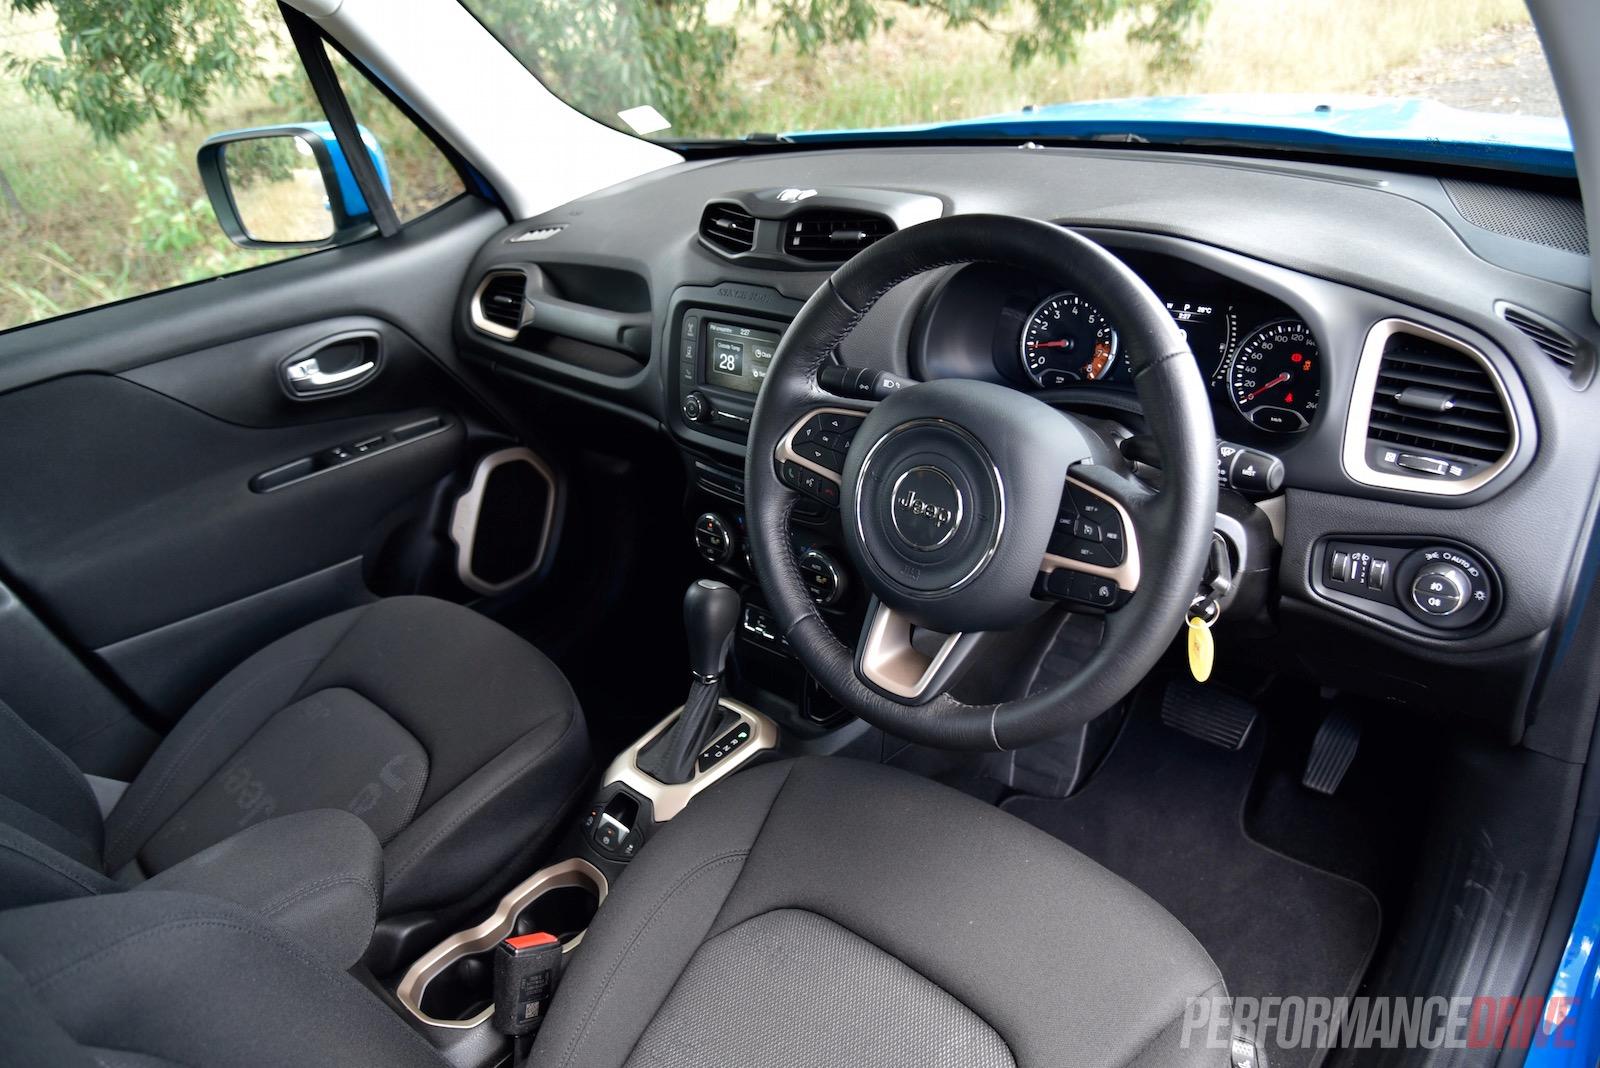 Jeep Renegade Interior >> 2016 Jeep Renegade Longitude review (video) | PerformanceDrive